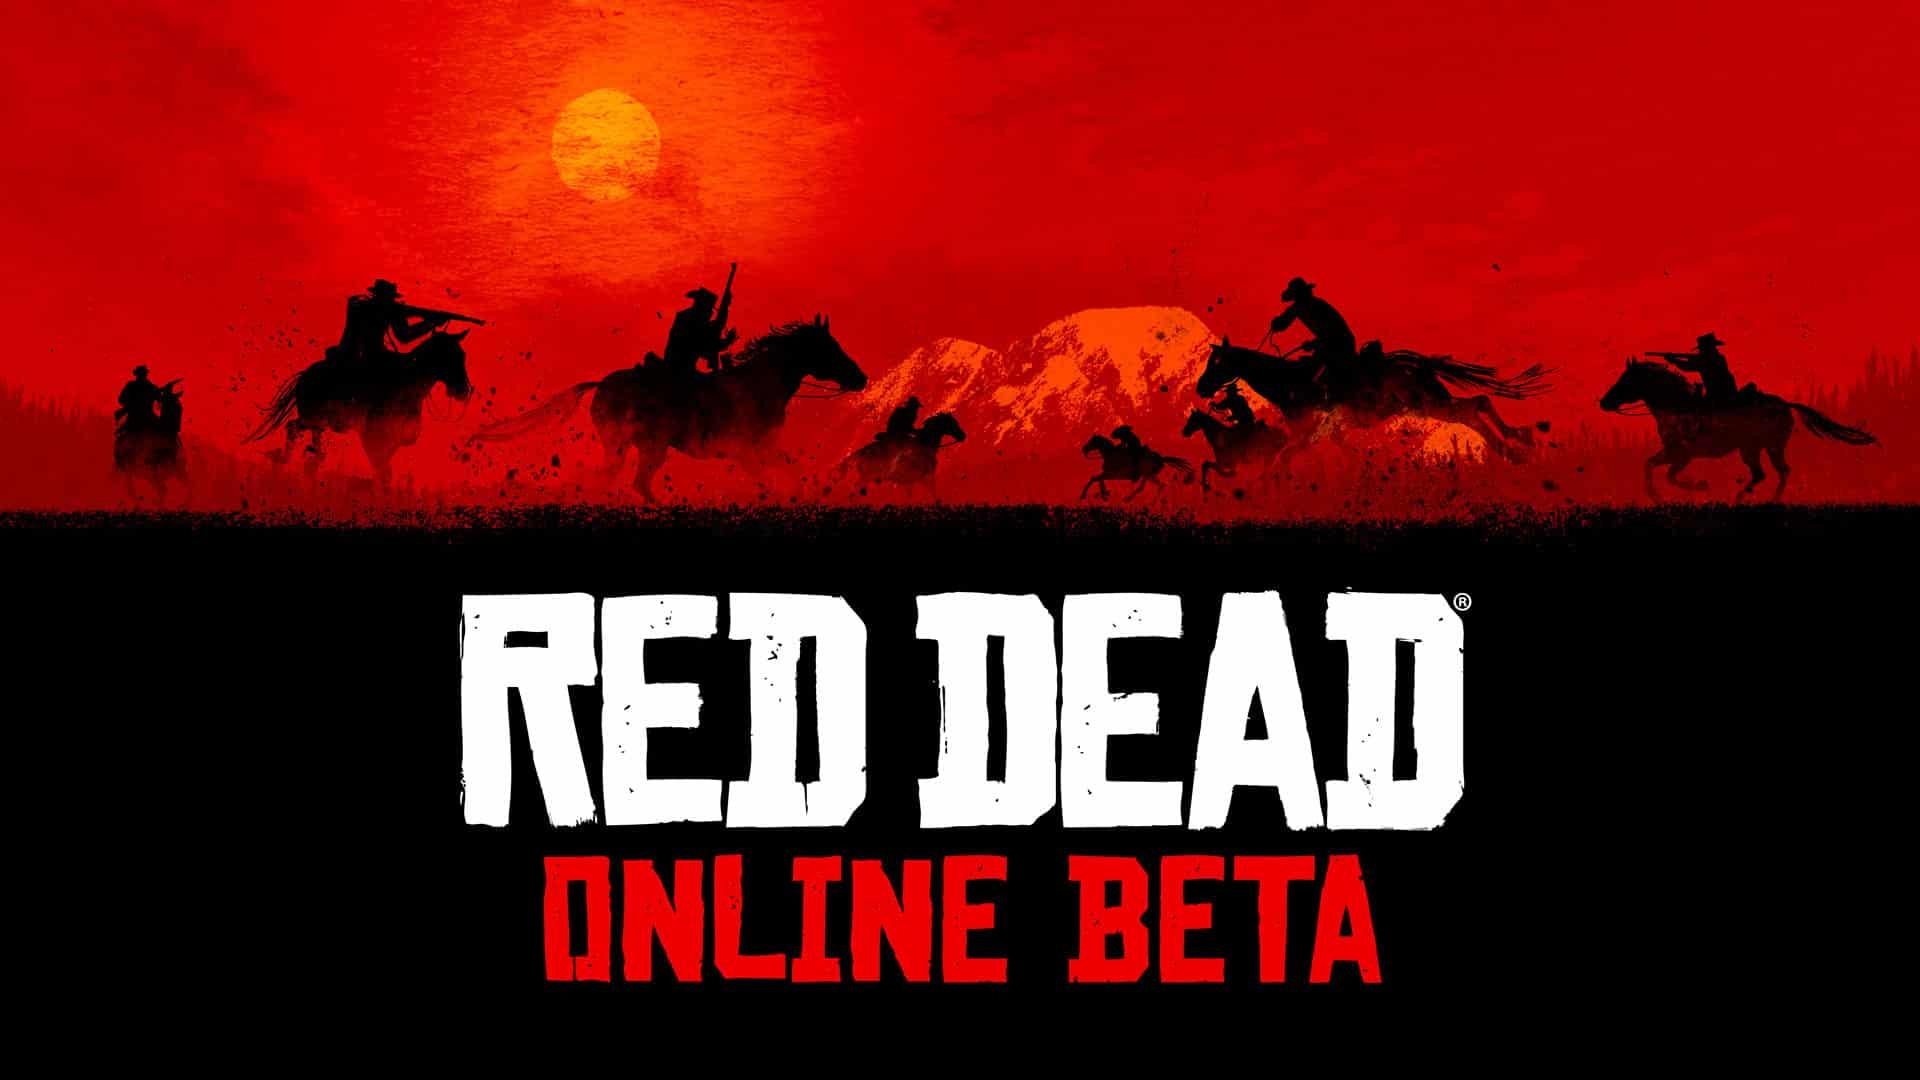 Red Dead online economy